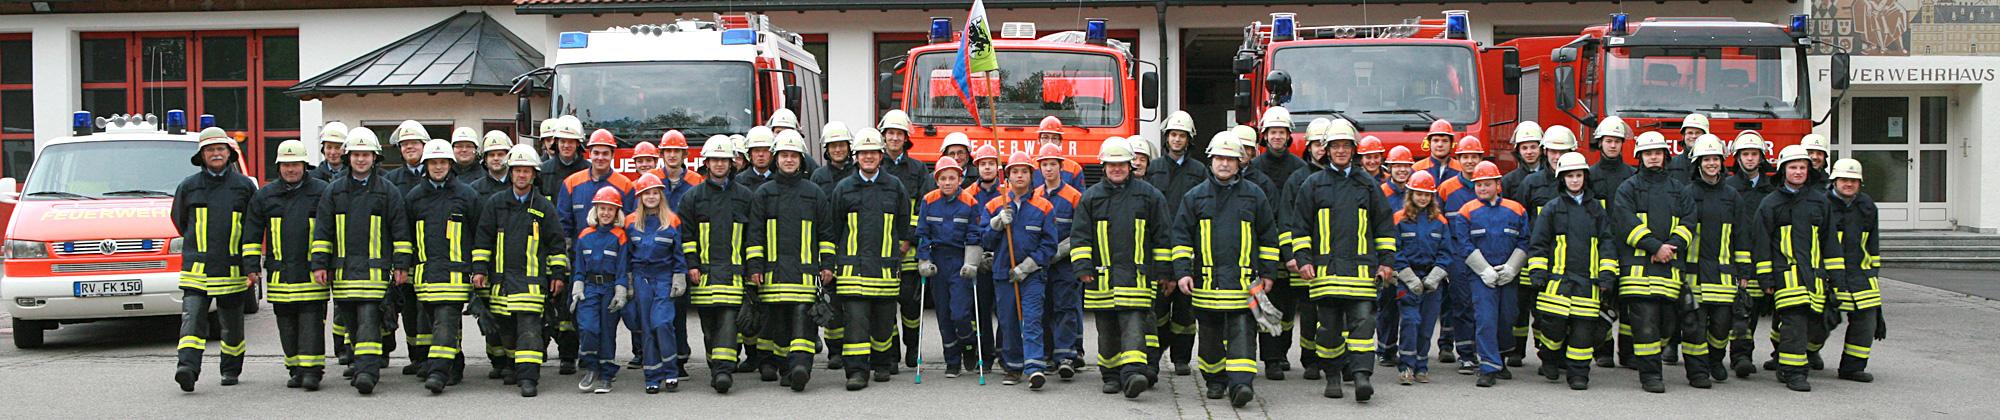 Freiwillige Feuerwehr Kißlegg